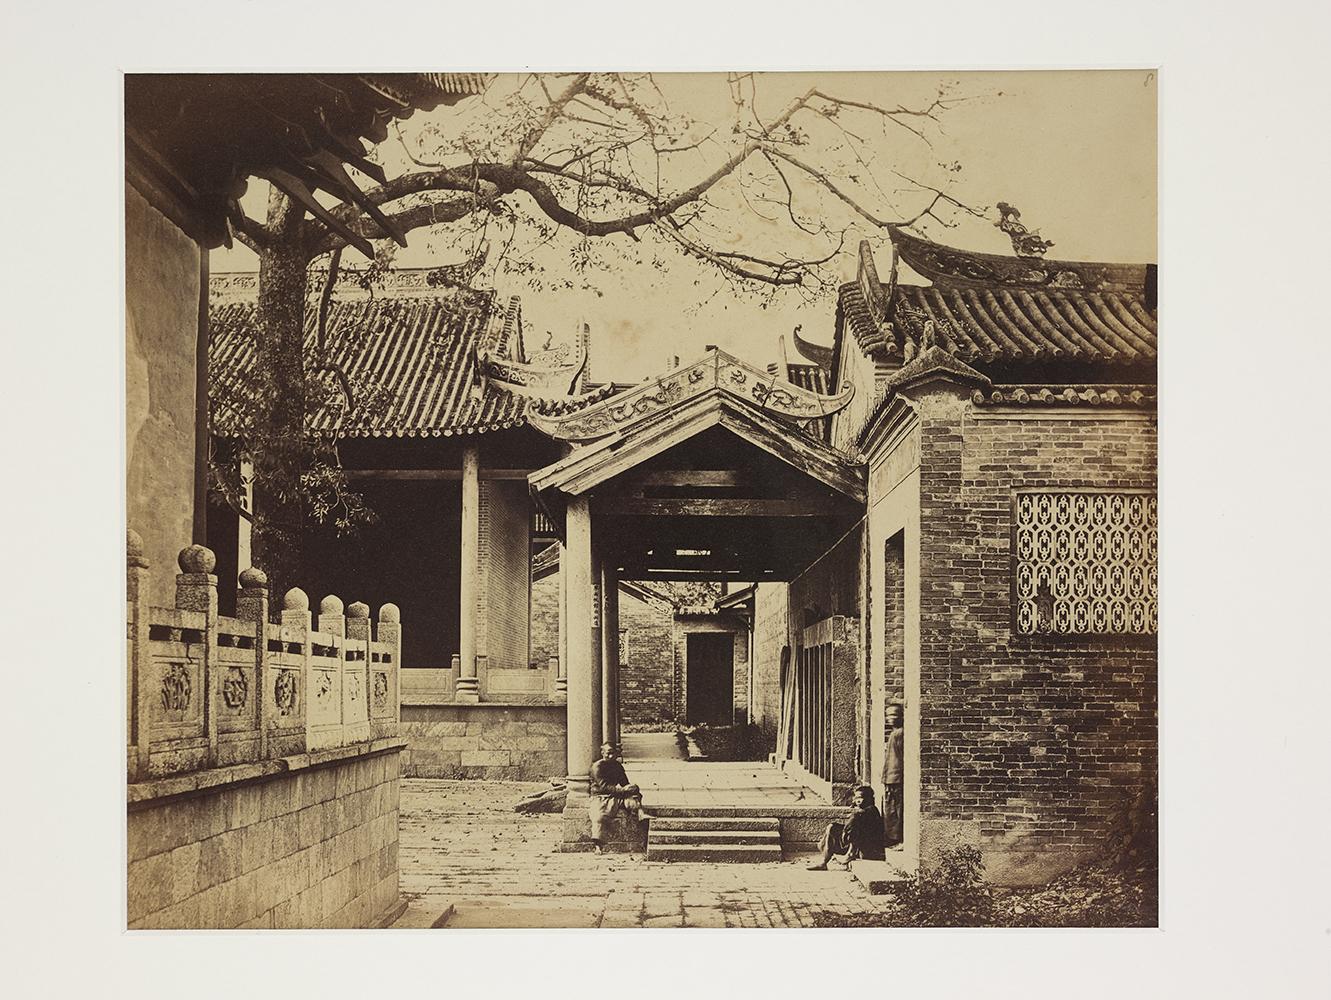 http://davidrowan.org/files/gimgs/55_canton-prints-number--32.jpg